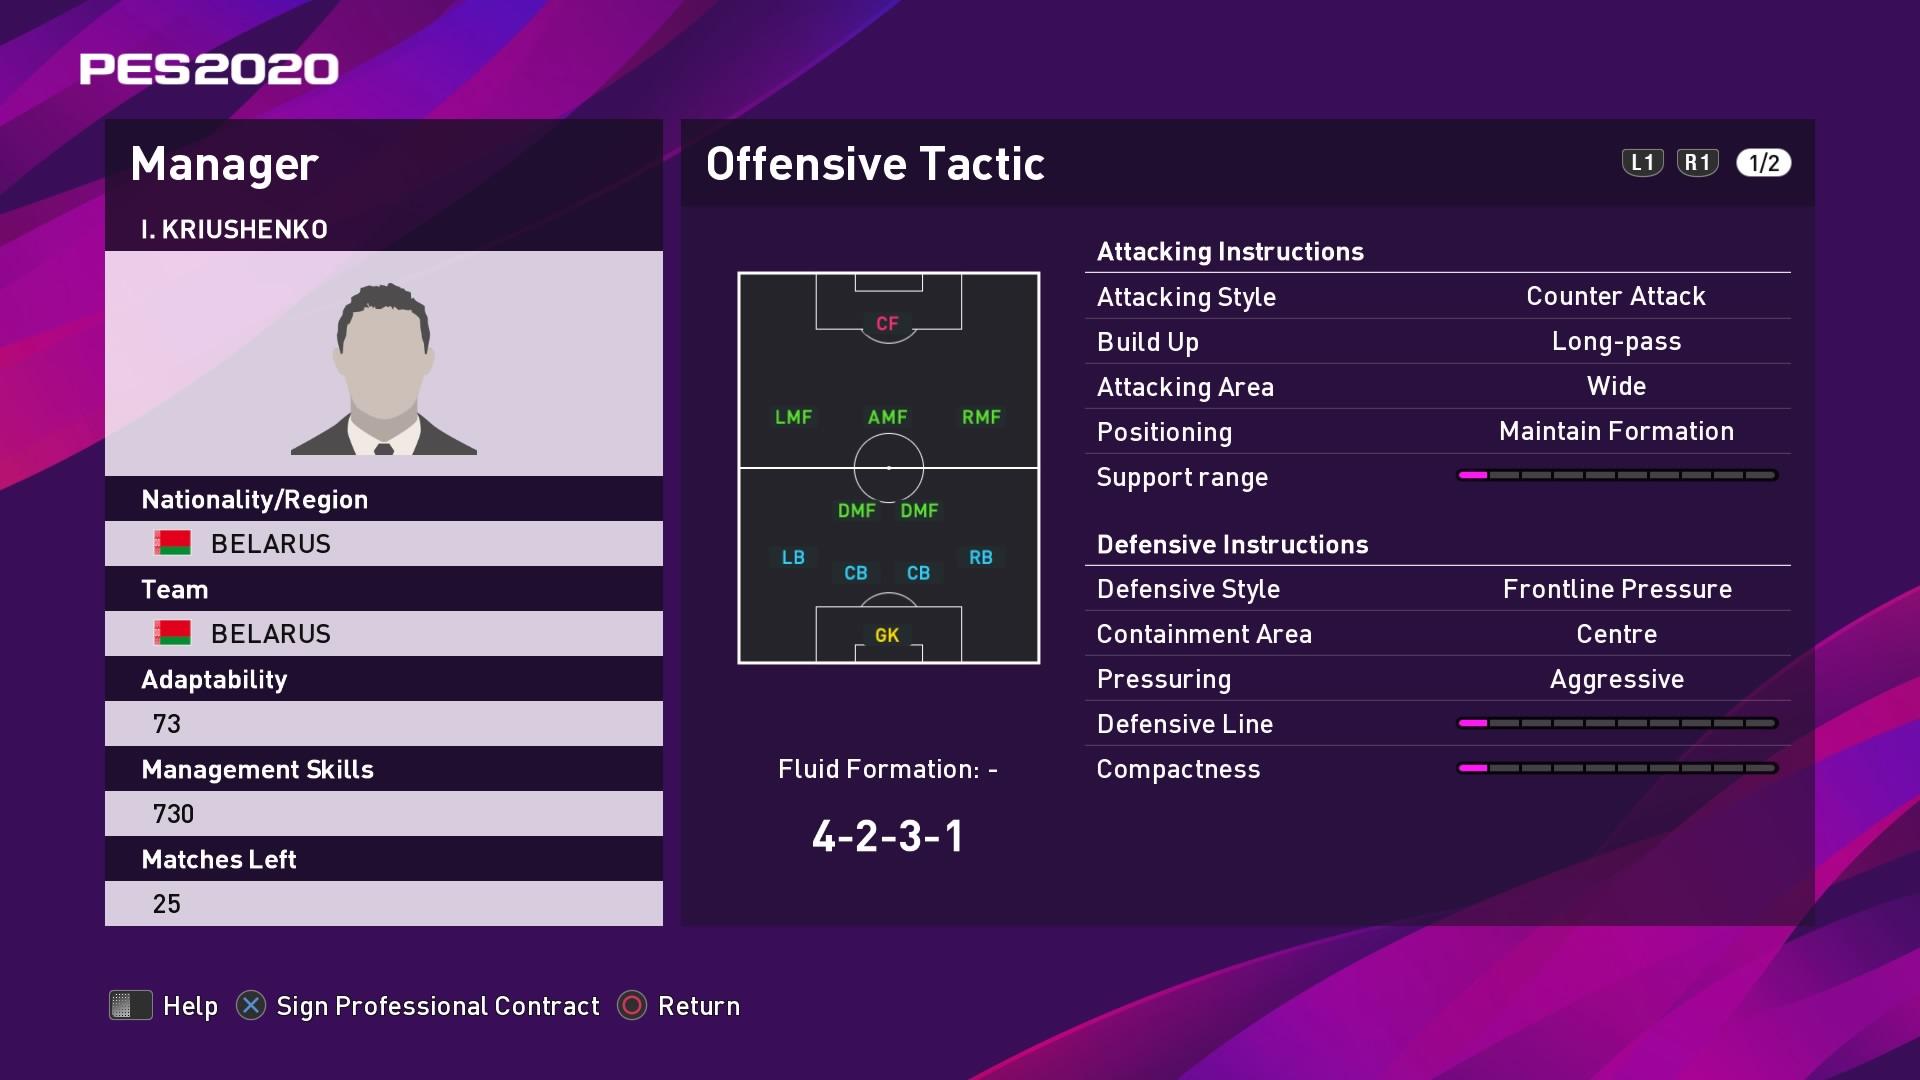 I. Kriushenko (Igor Kriushenko) Offensive Tactic in PES 2020 myClub